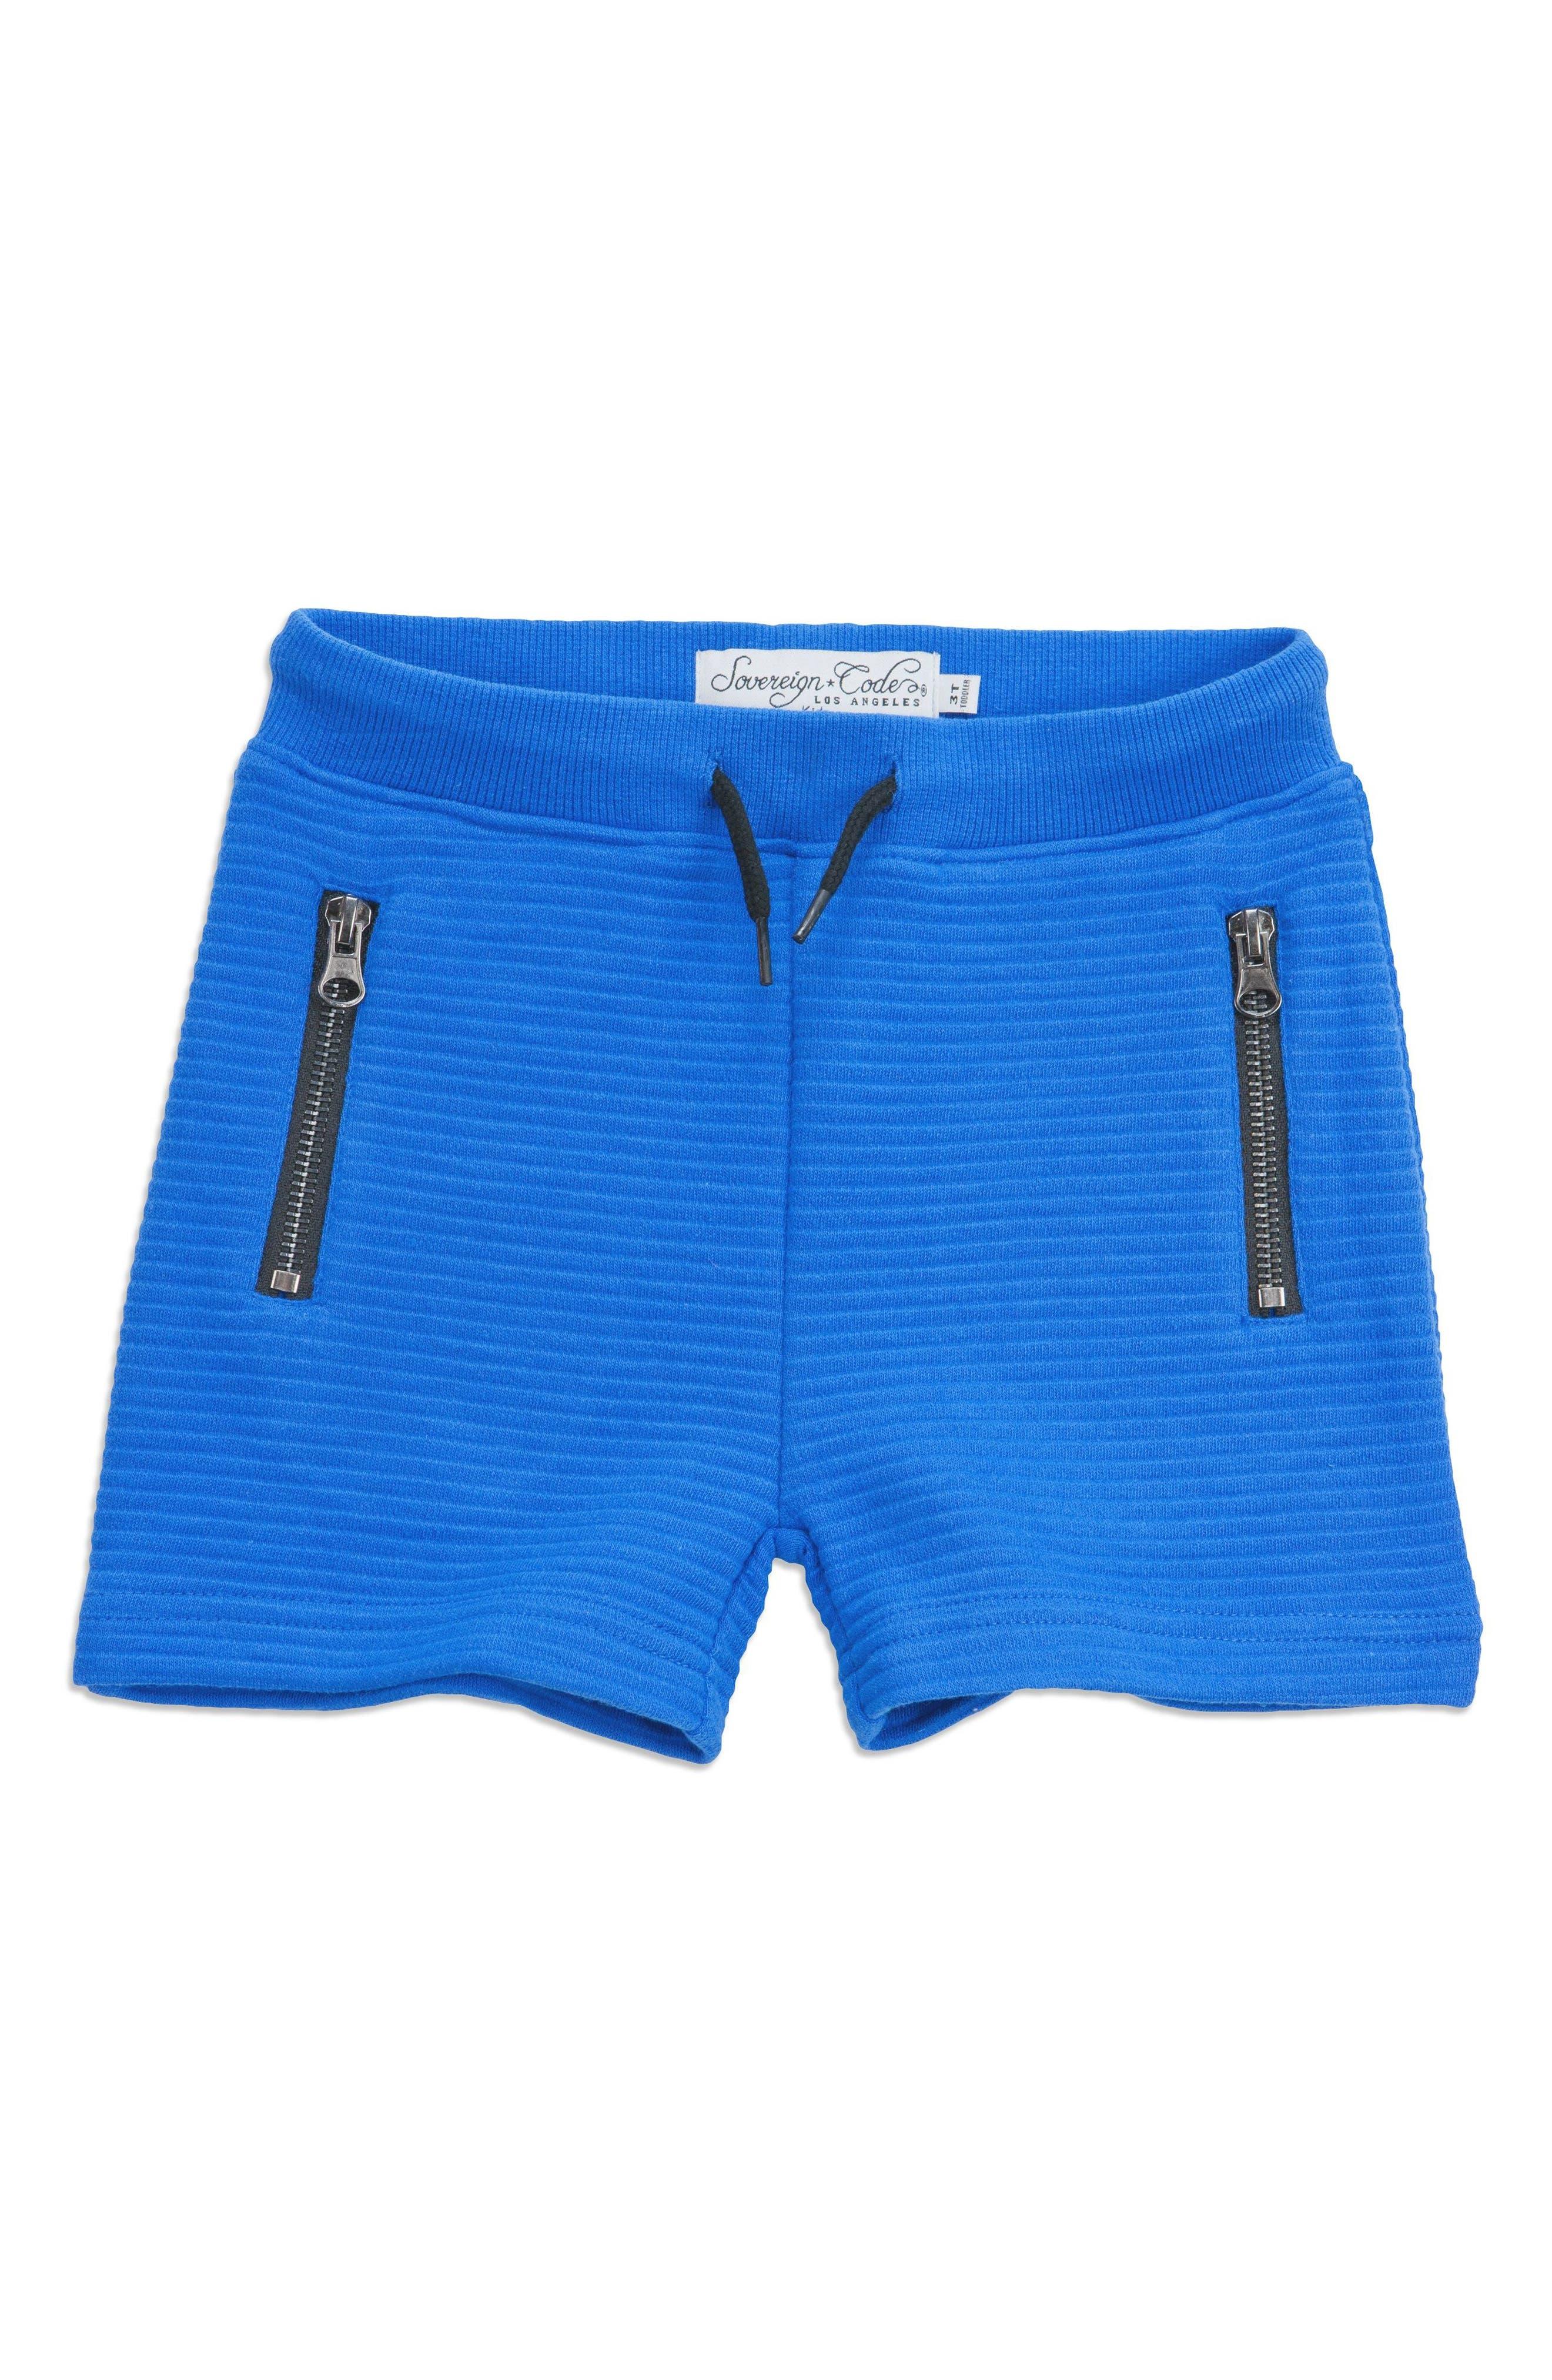 Academy Shorts,                         Main,                         color, Cobalt